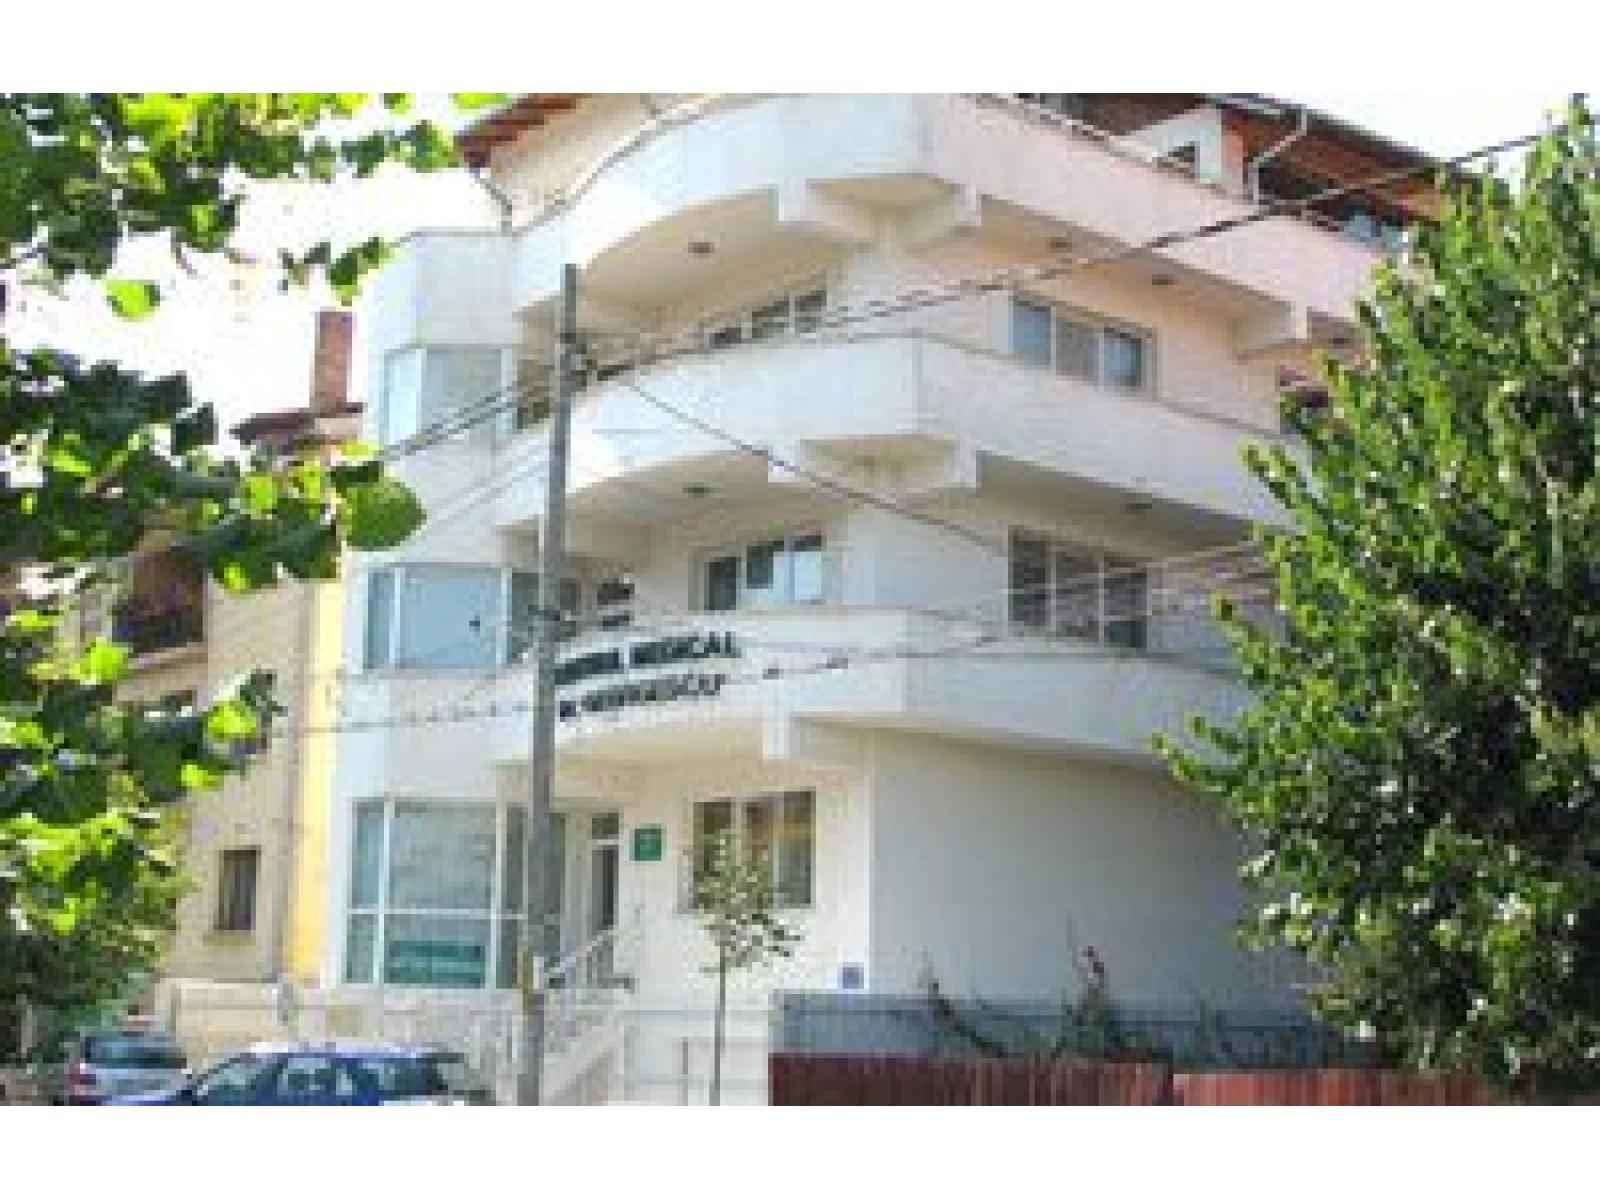 Centrul Medical Dr. Georgescu - clinica1.jpg